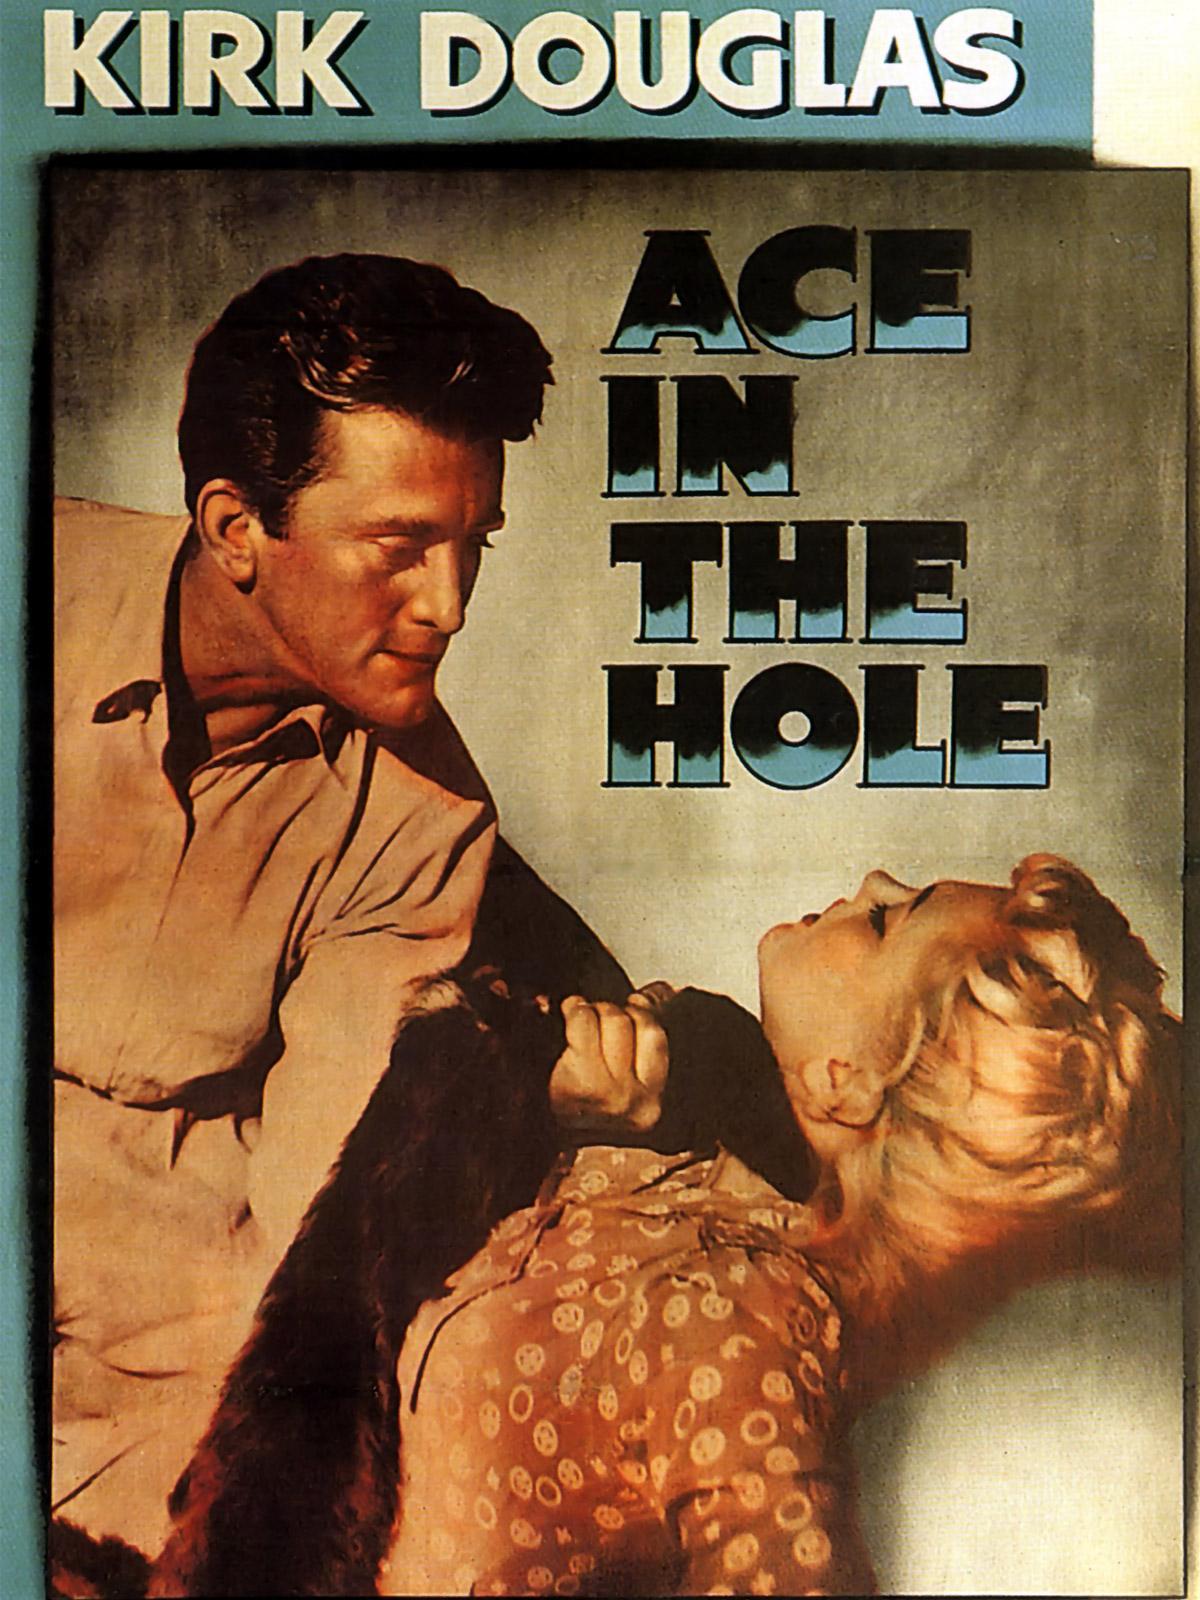 download ace in the hole script pdf ebrutracker